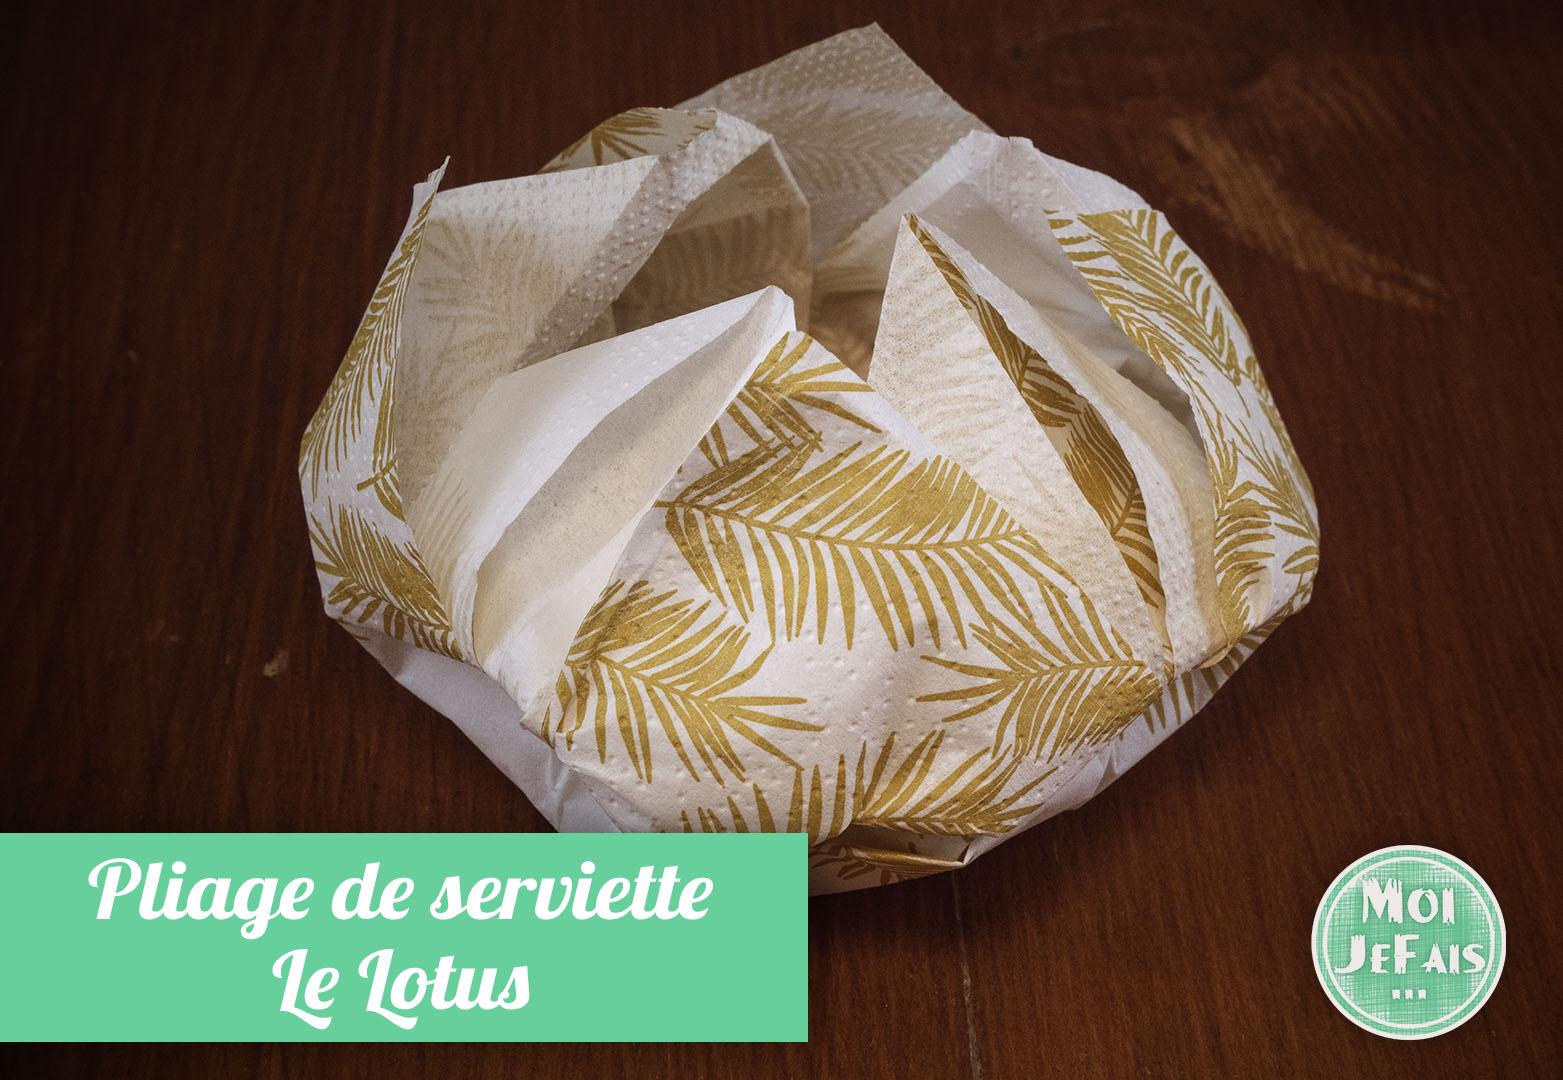 pliage serviette lotus